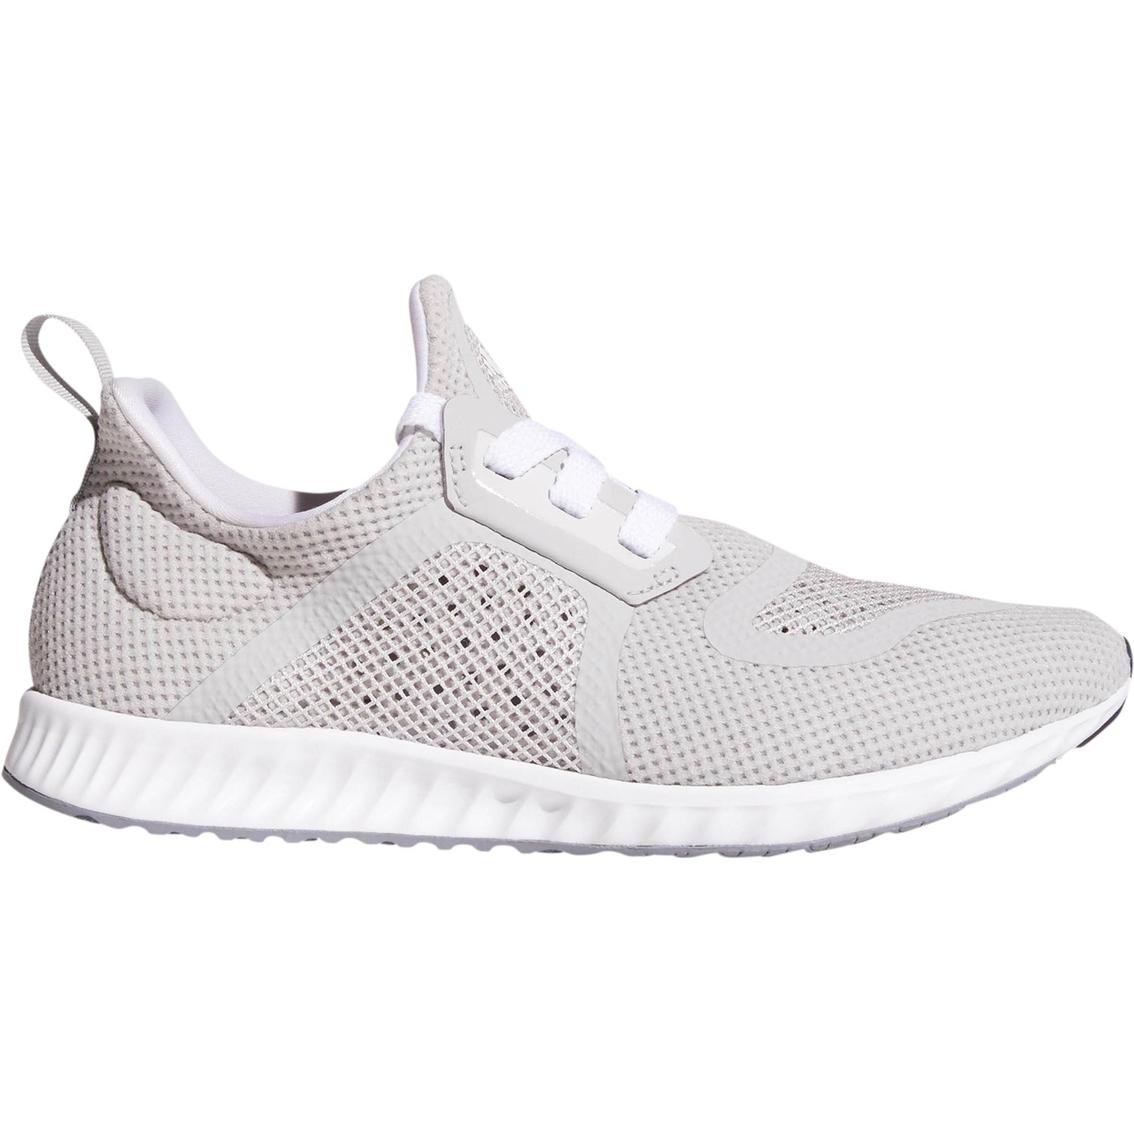 f2cac7c6853e8e Adidas Women s Edge Lux Clima Running Shoes